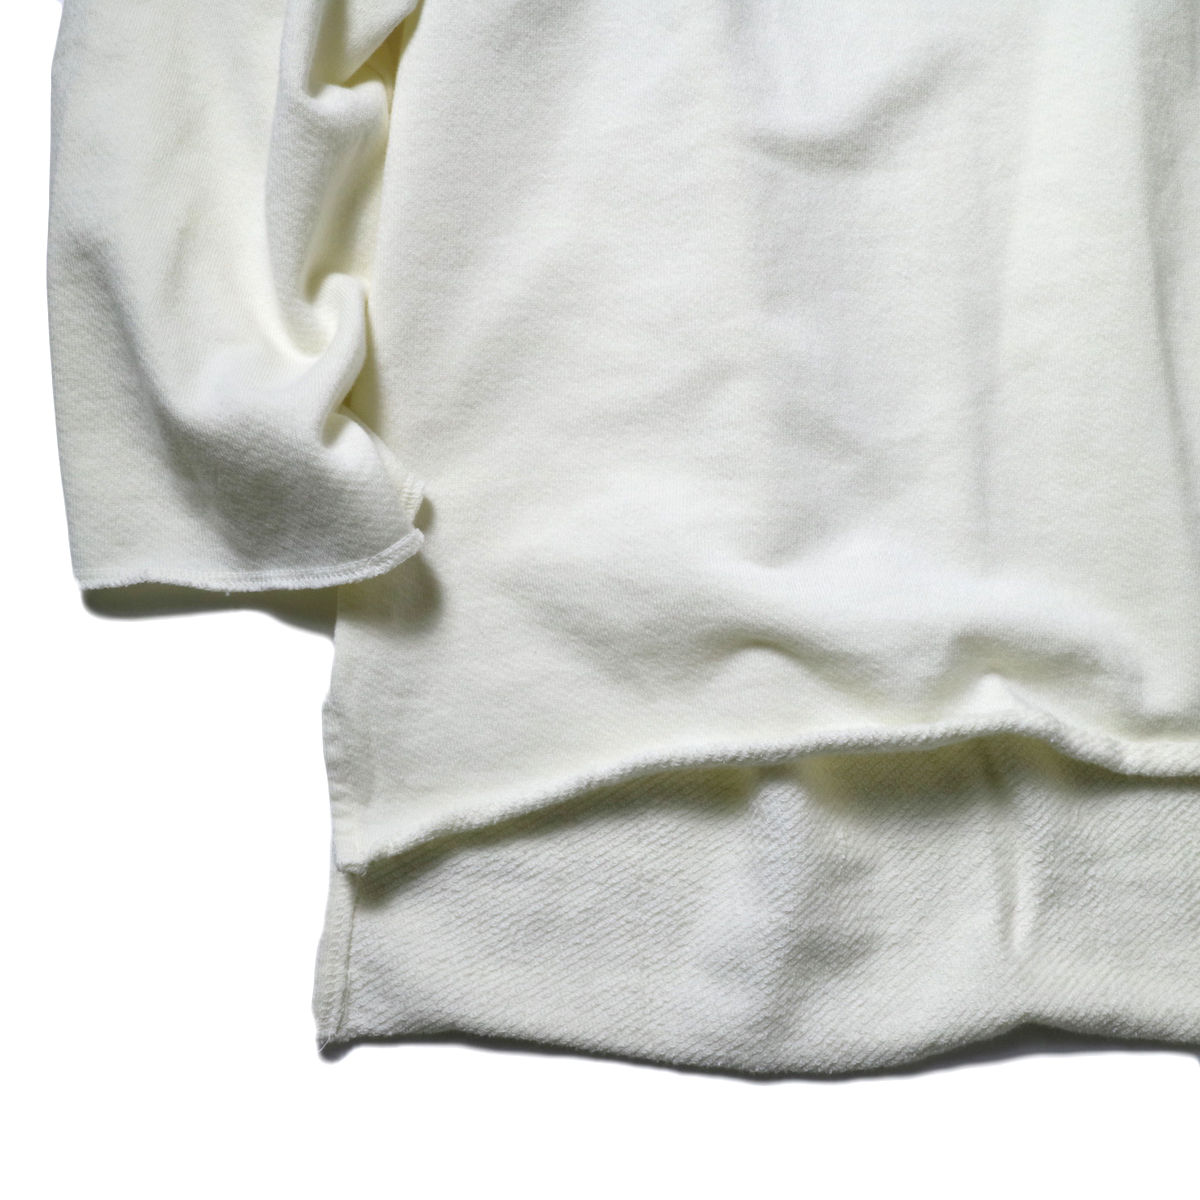 alvana / ULTIMATE CUT OFF L/S PO (IVORY)袖、裾